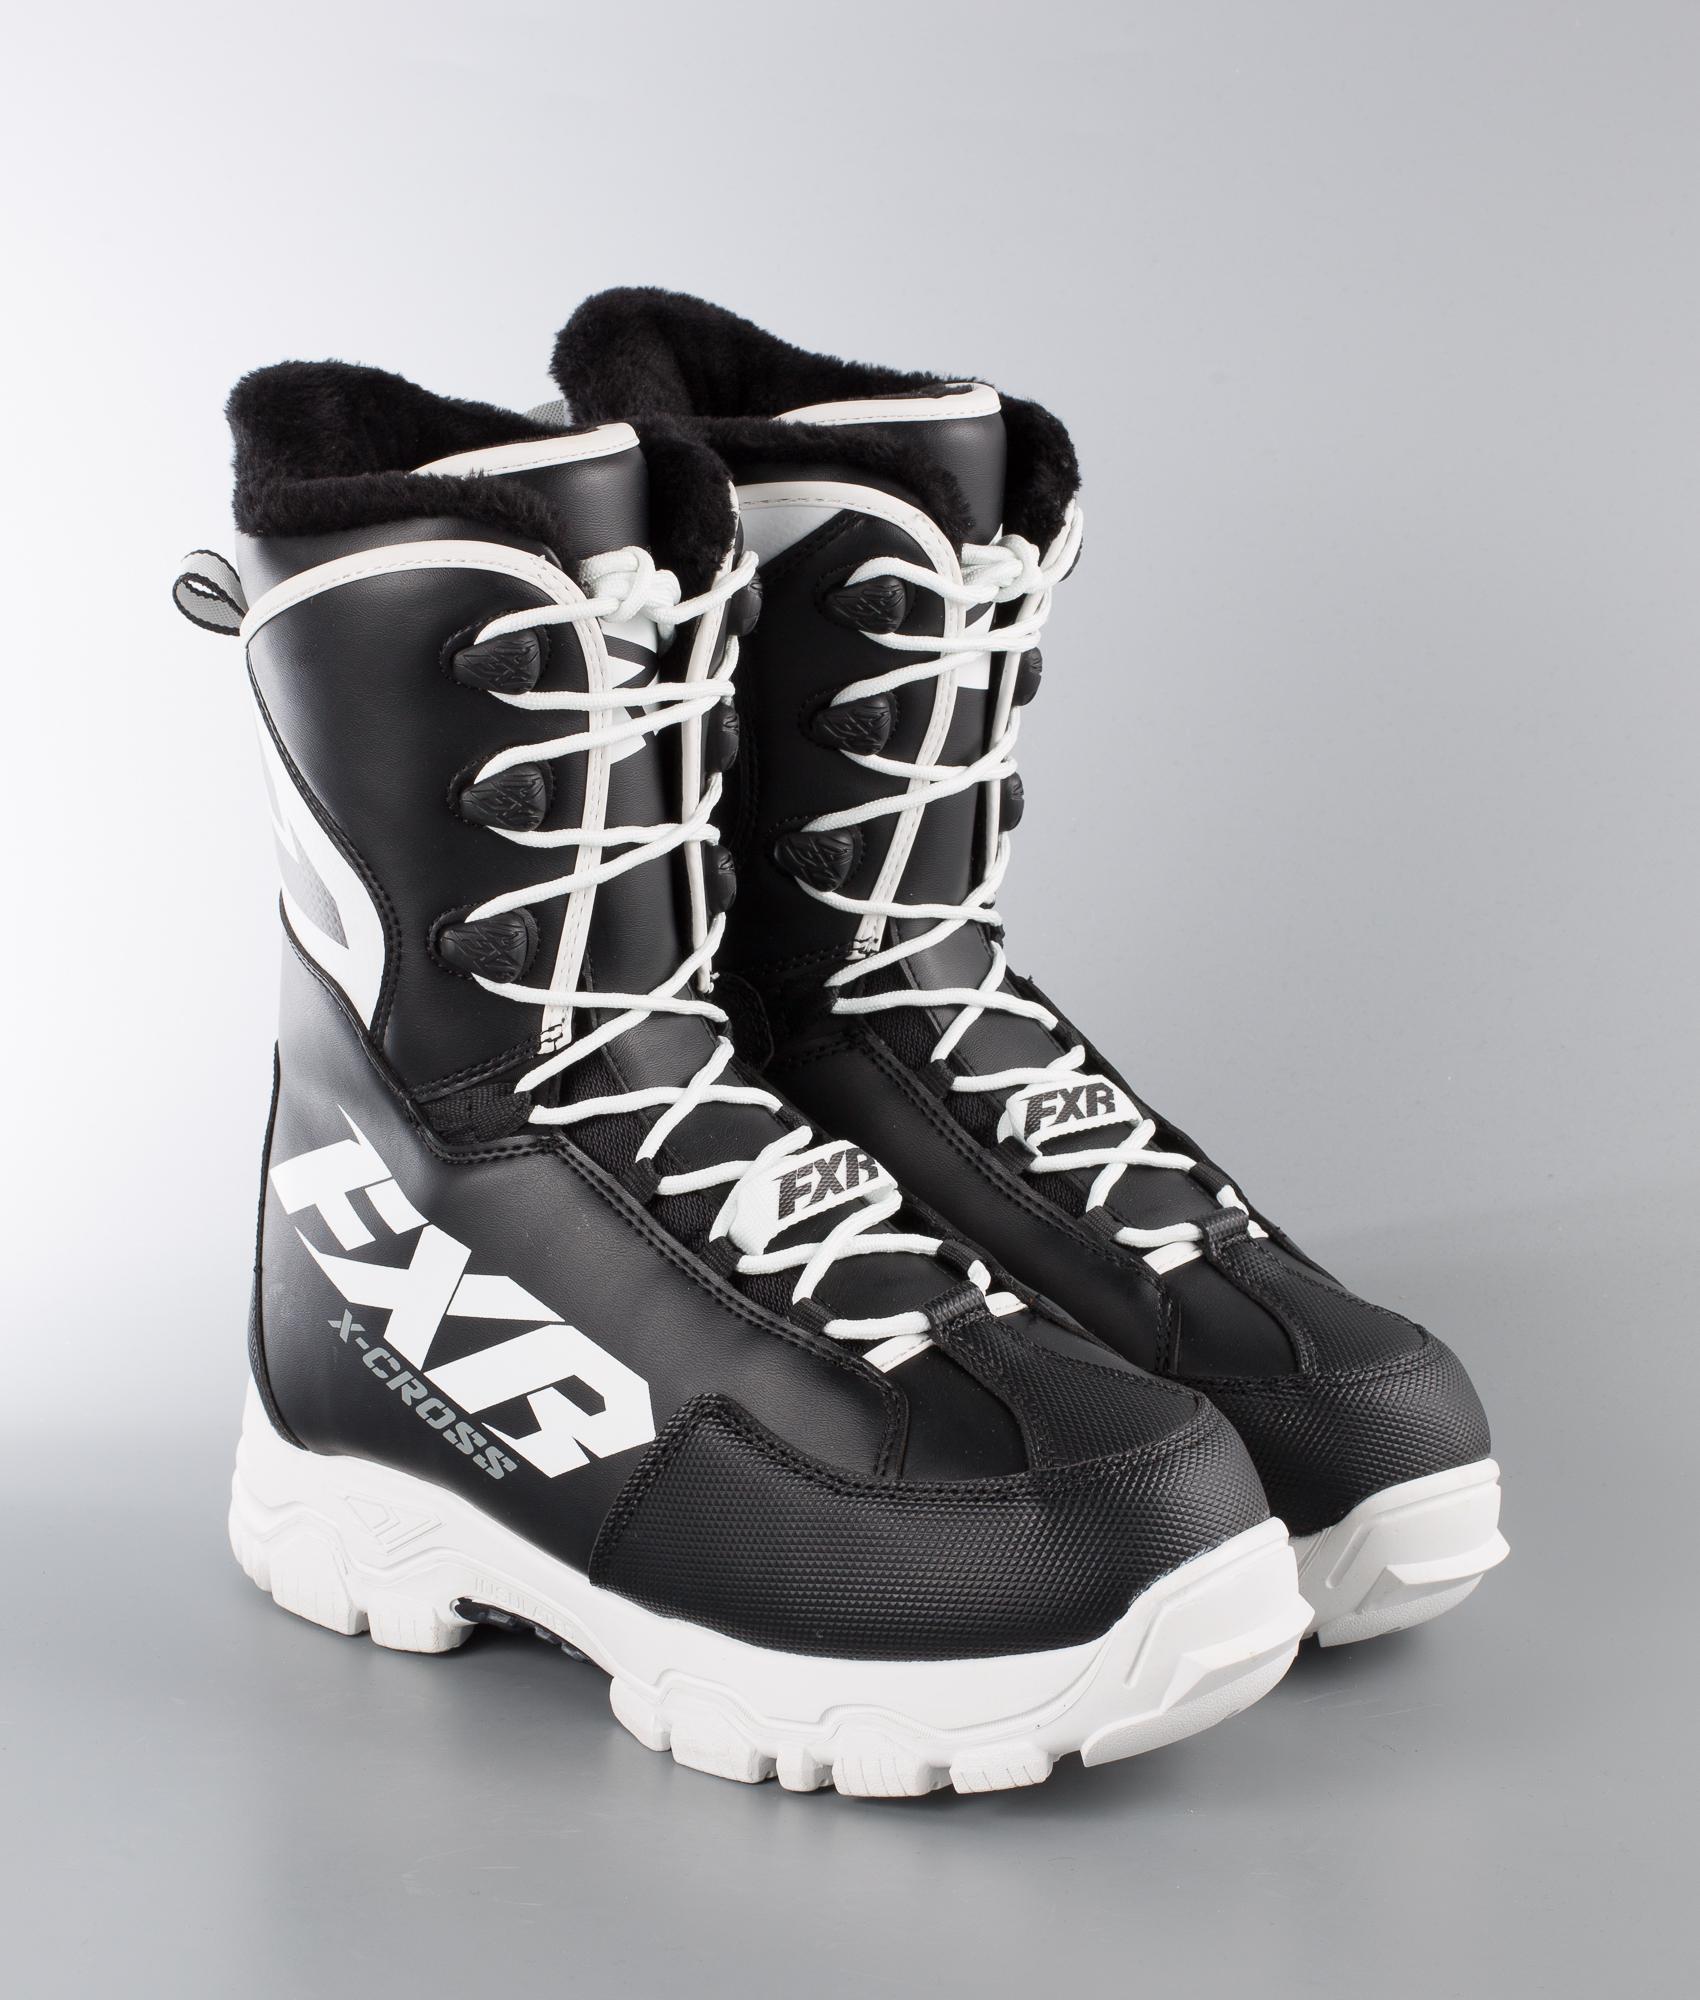 FXR X Cross Speed Boots Skoter BlackWhite Ridestore.se